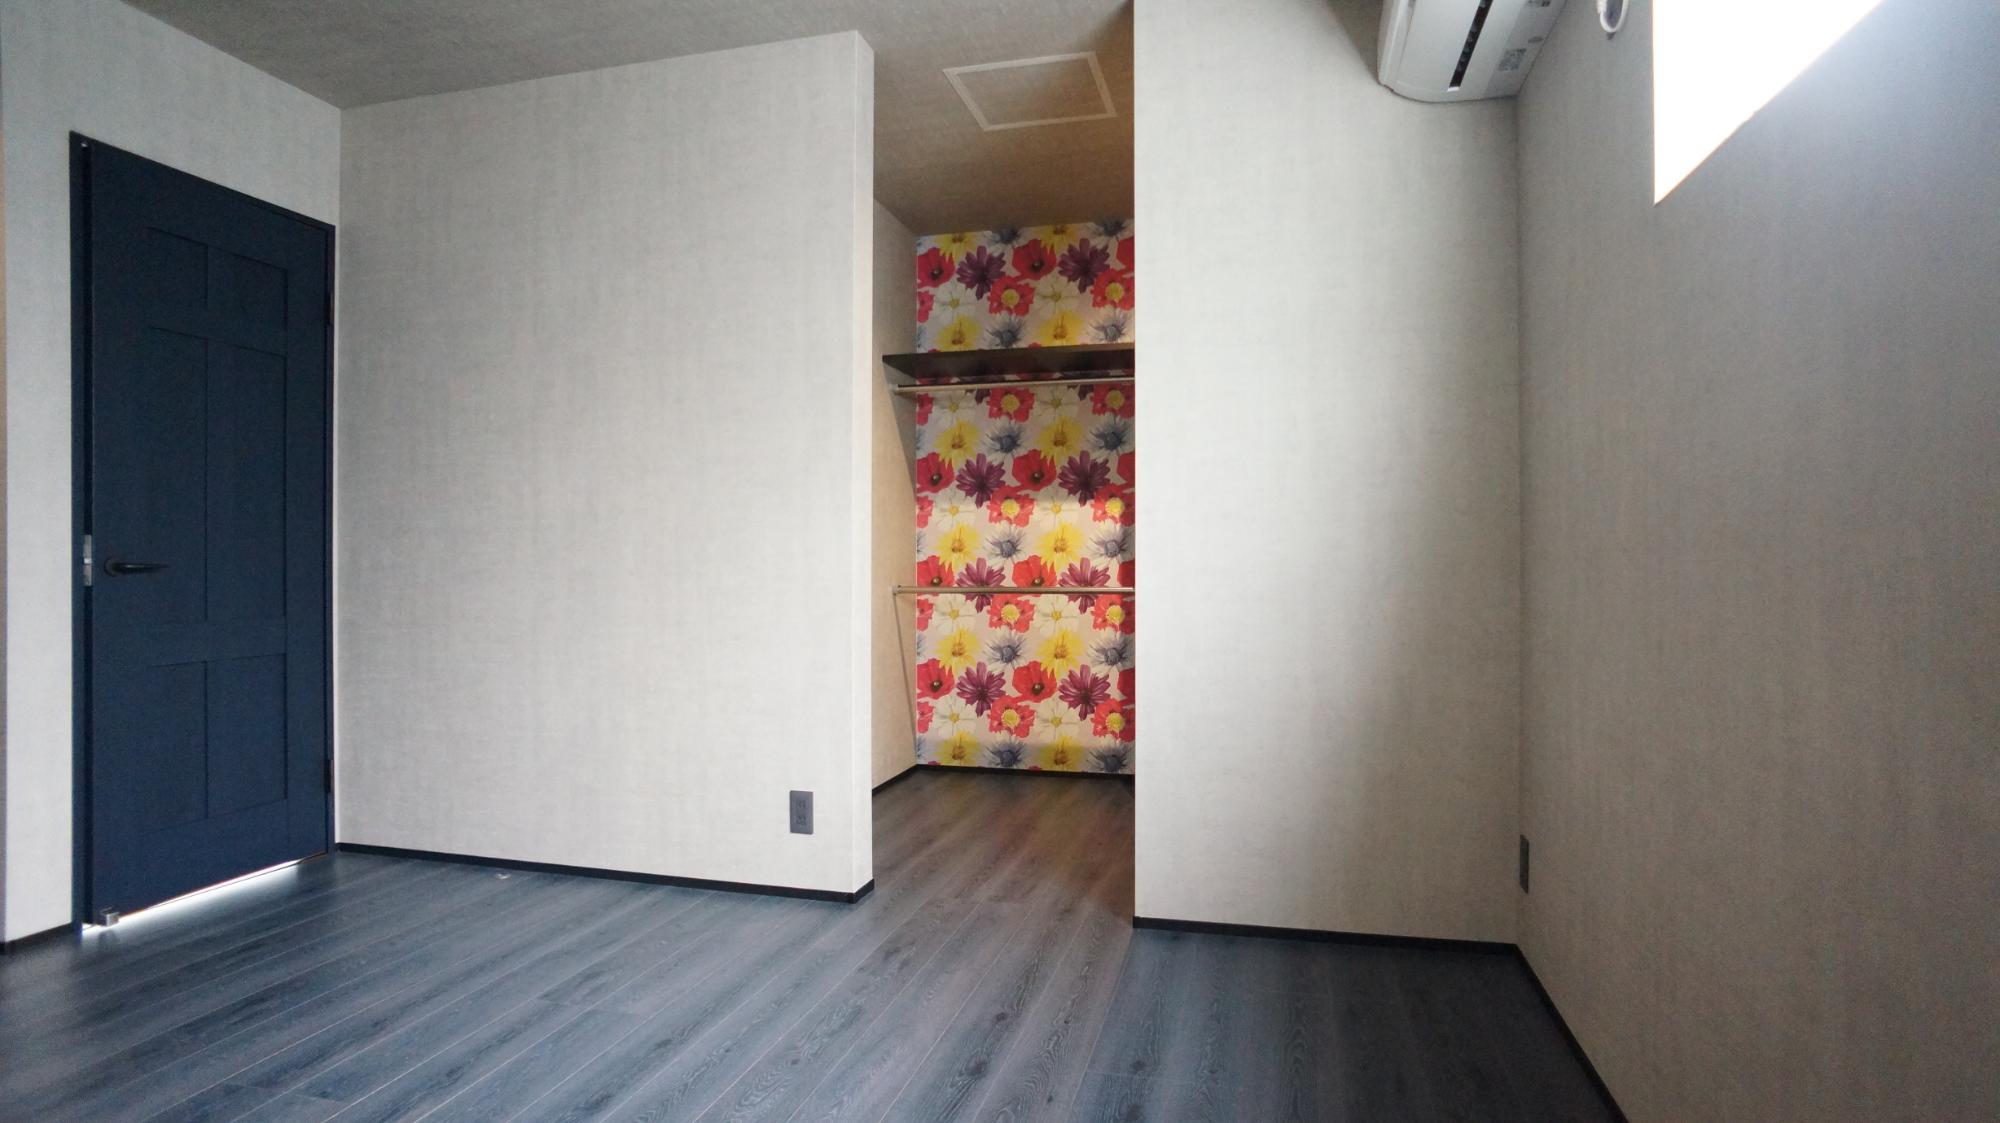 H.FACTORY/株式会社 橋本技建「吹き抜けのあるインダストリアルの家」の居室の実例写真